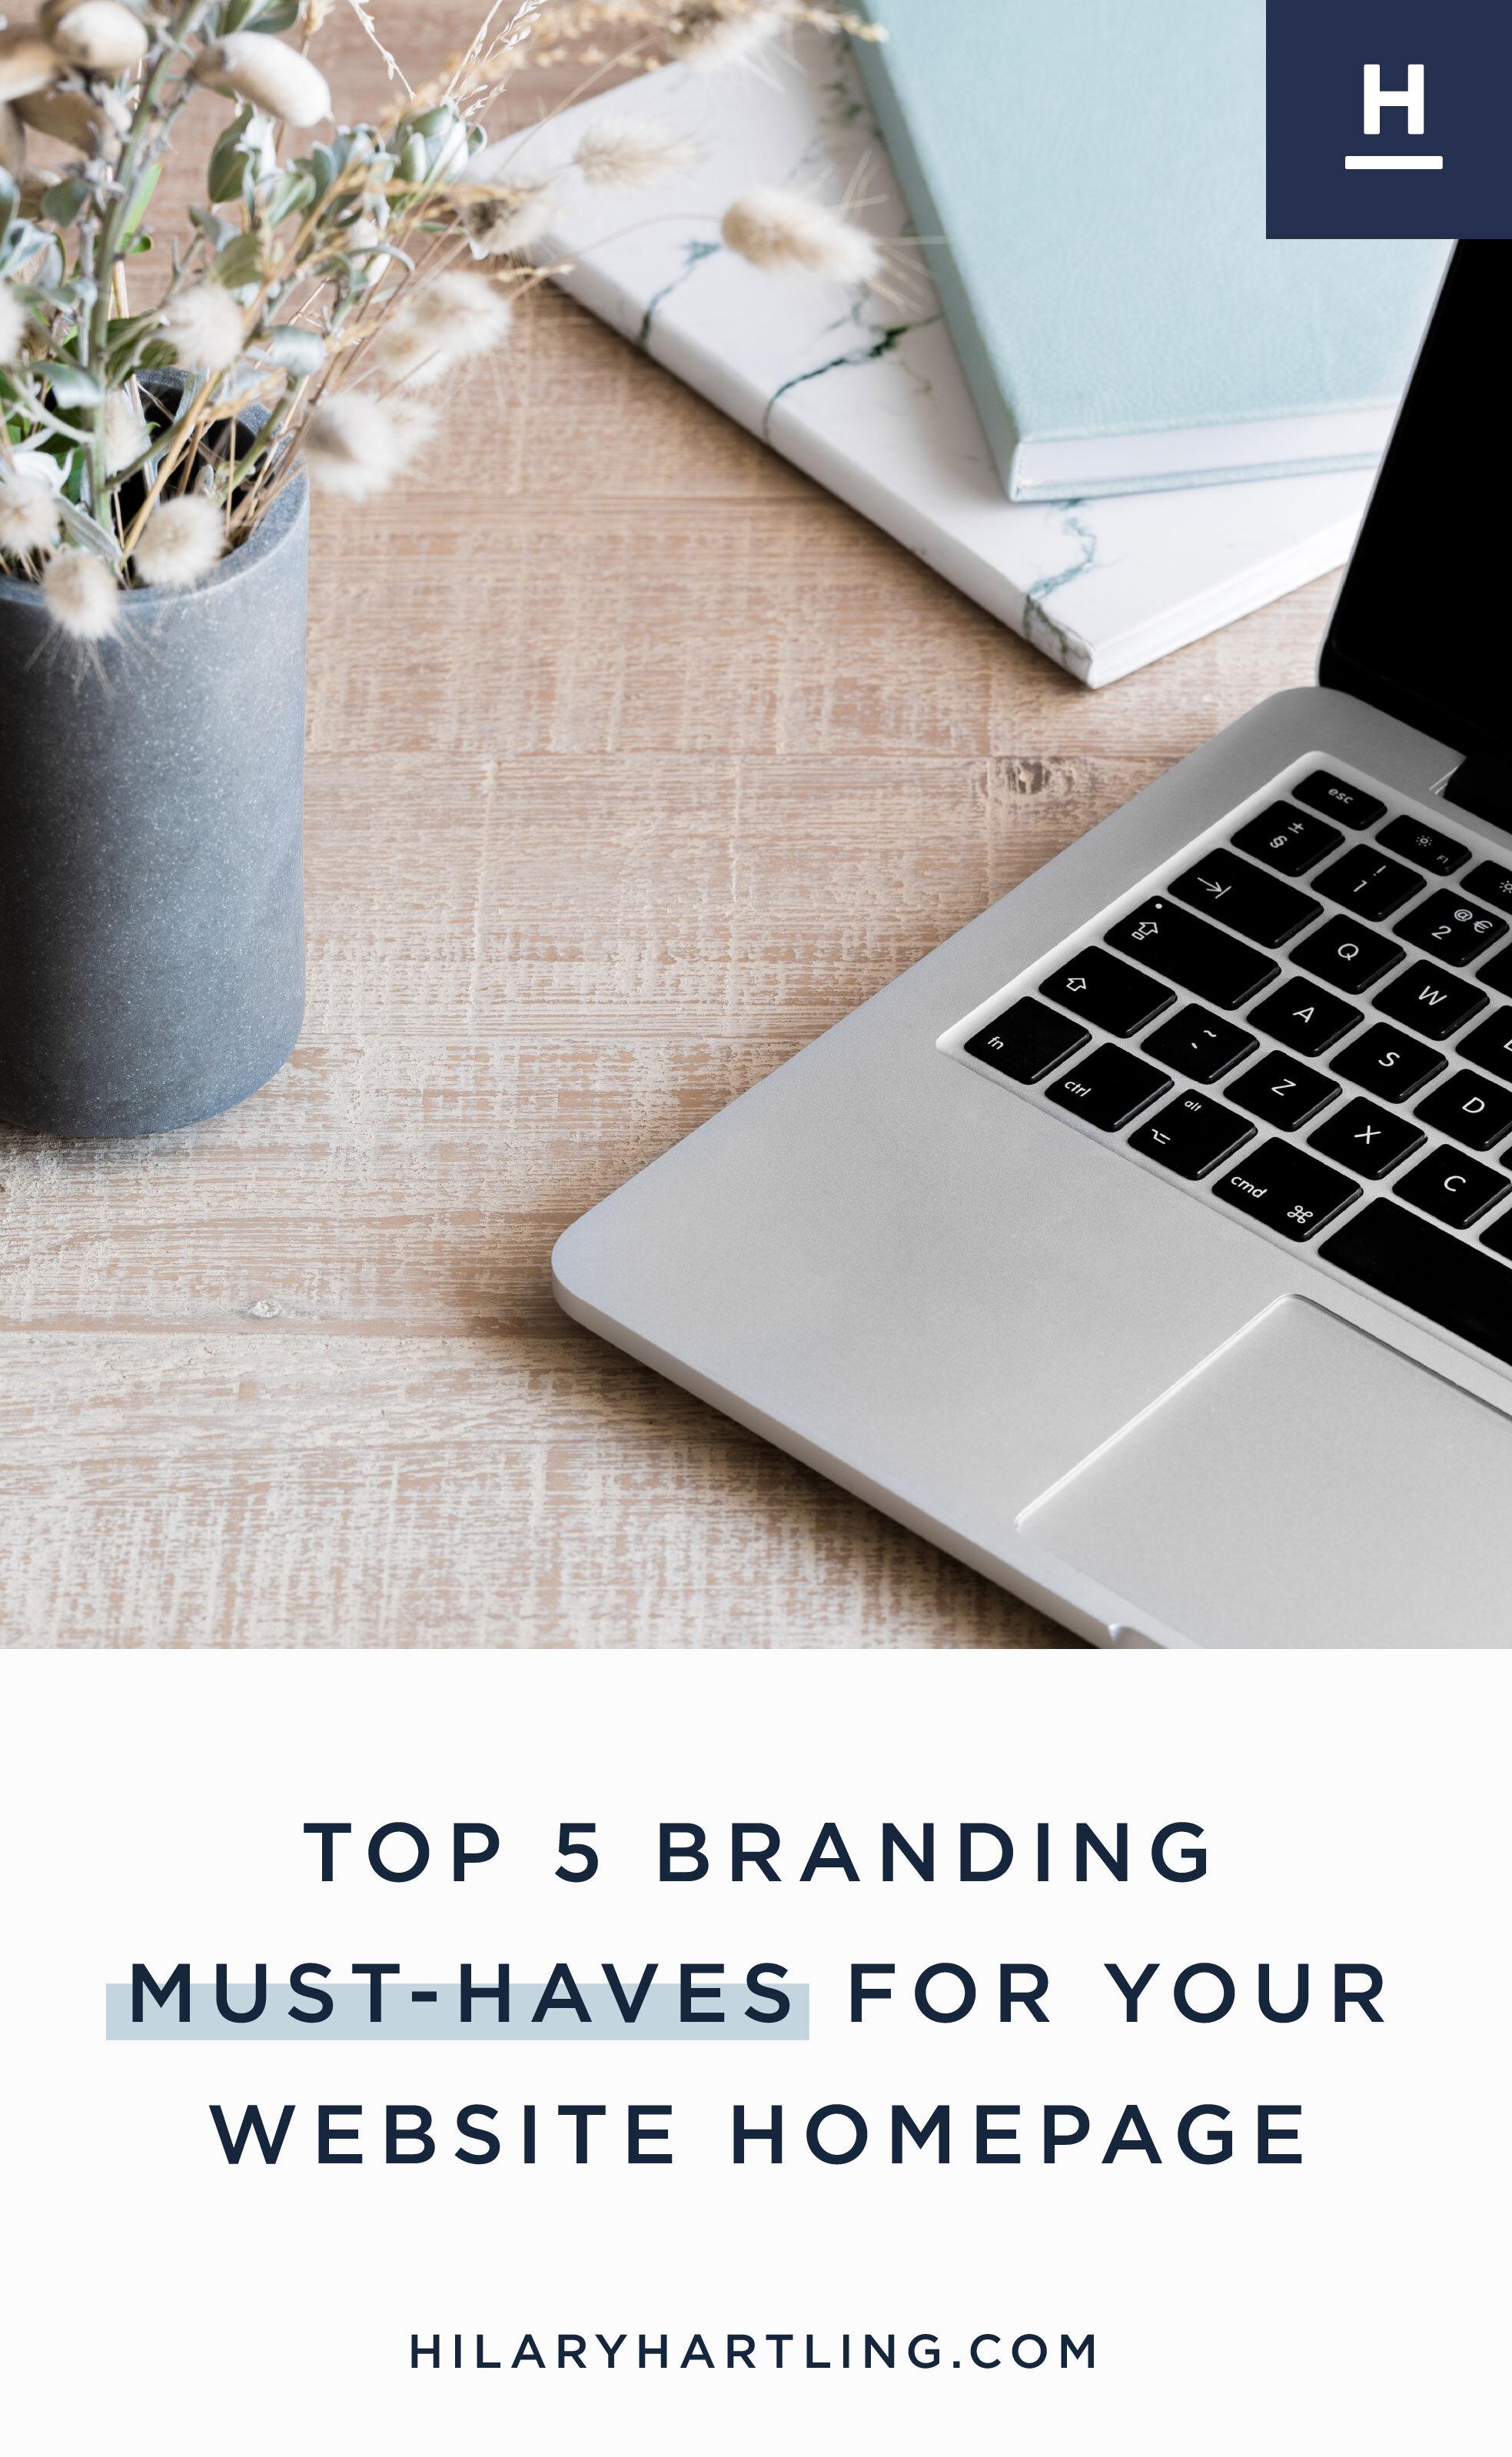 Top-5-Branding-Must-Haves-For-Your-Website-Homepage 2.jpg